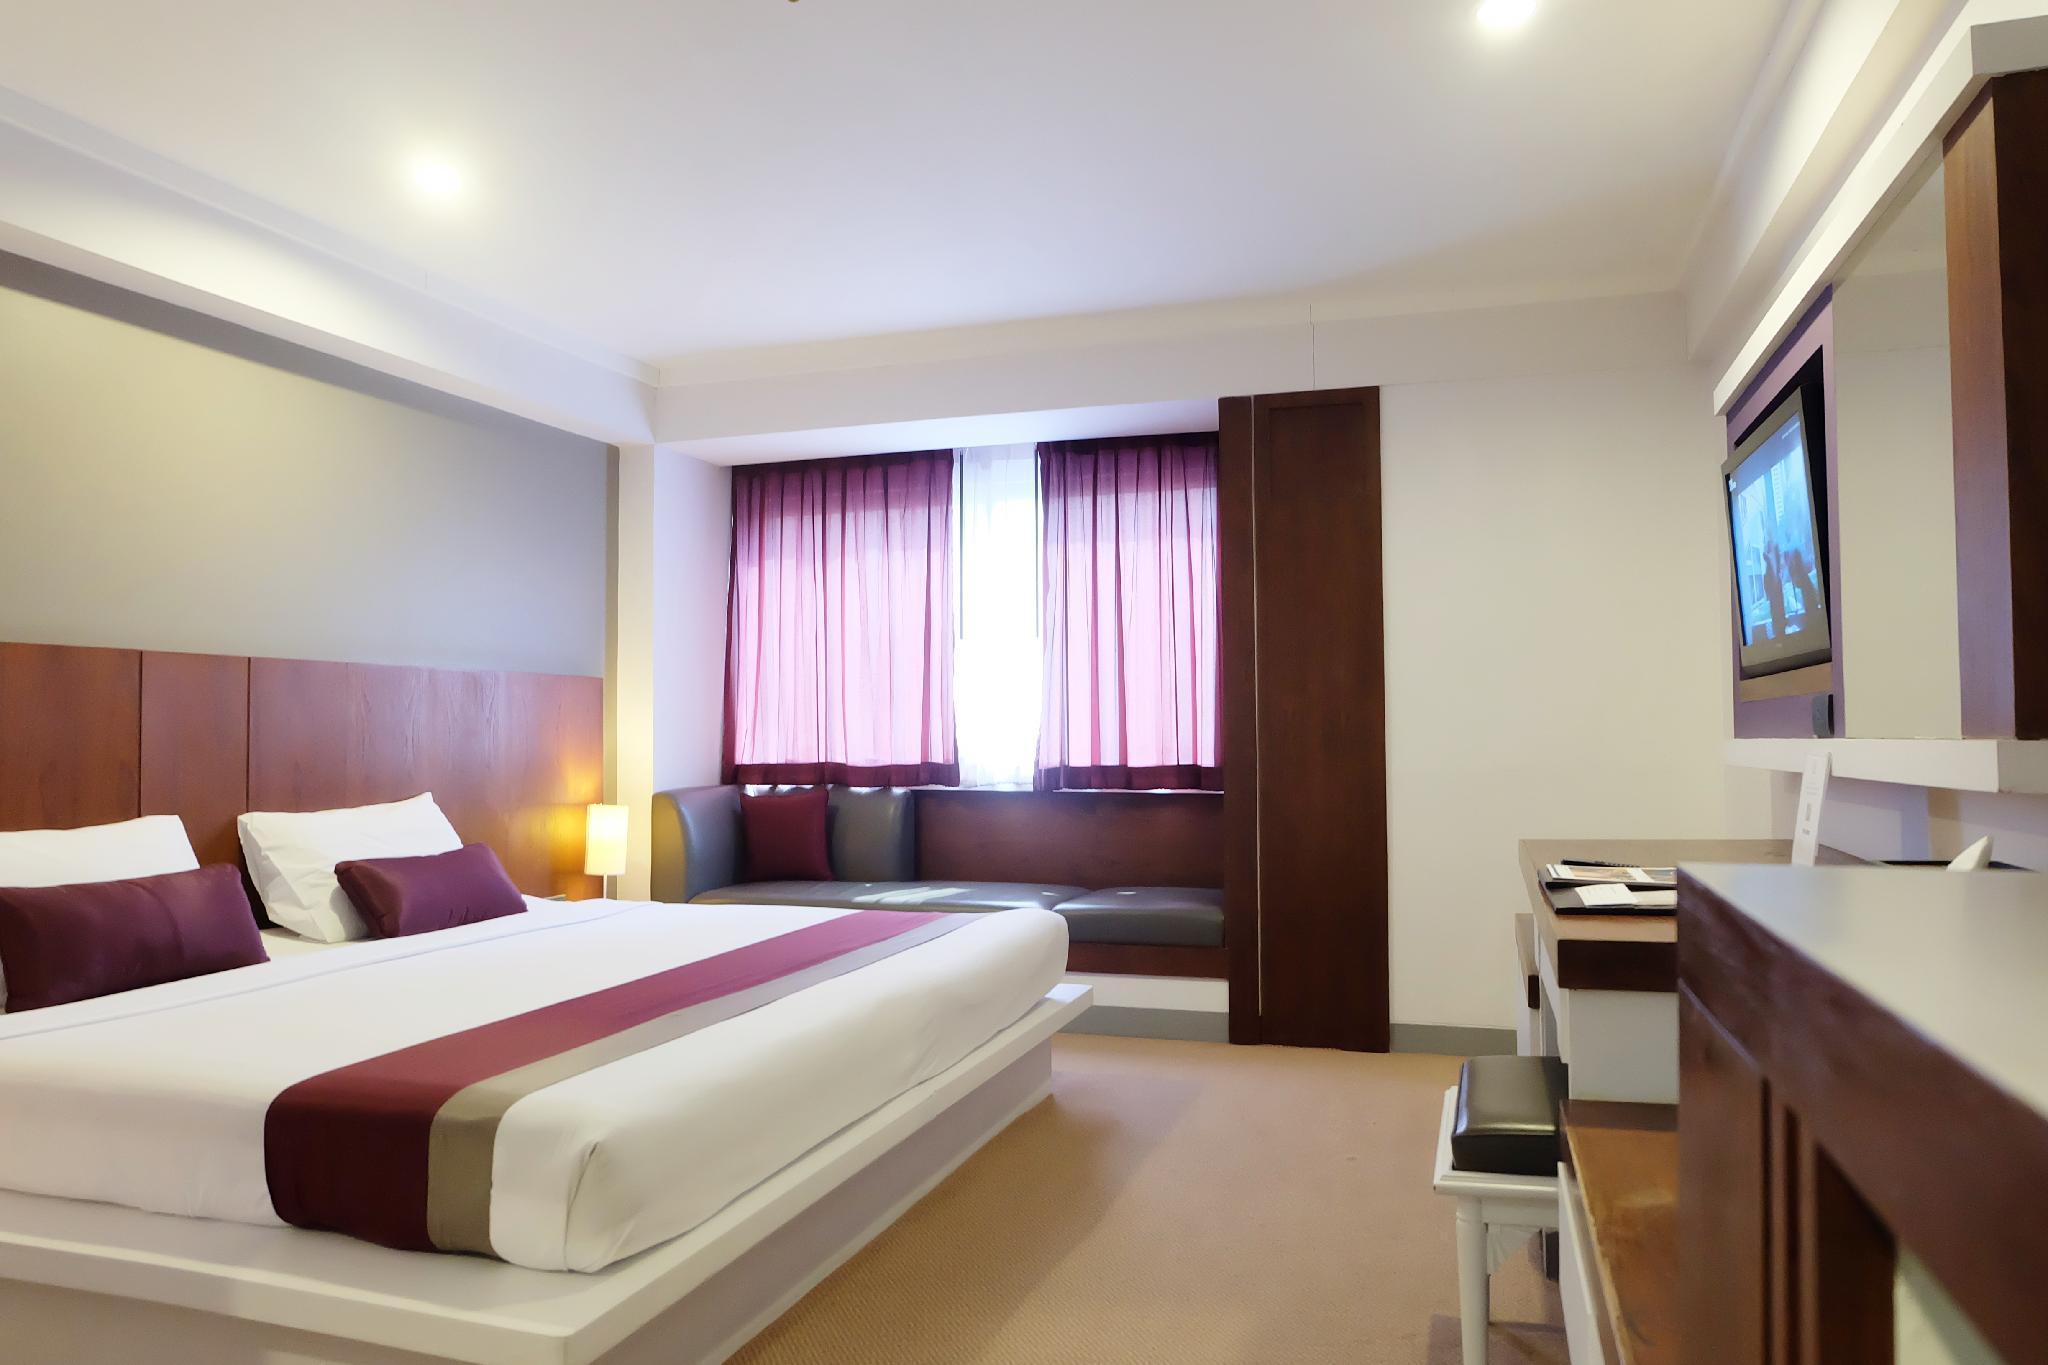 Star Hotel Chiang Mai โรงแรมสตาร์ เชียงใหม่